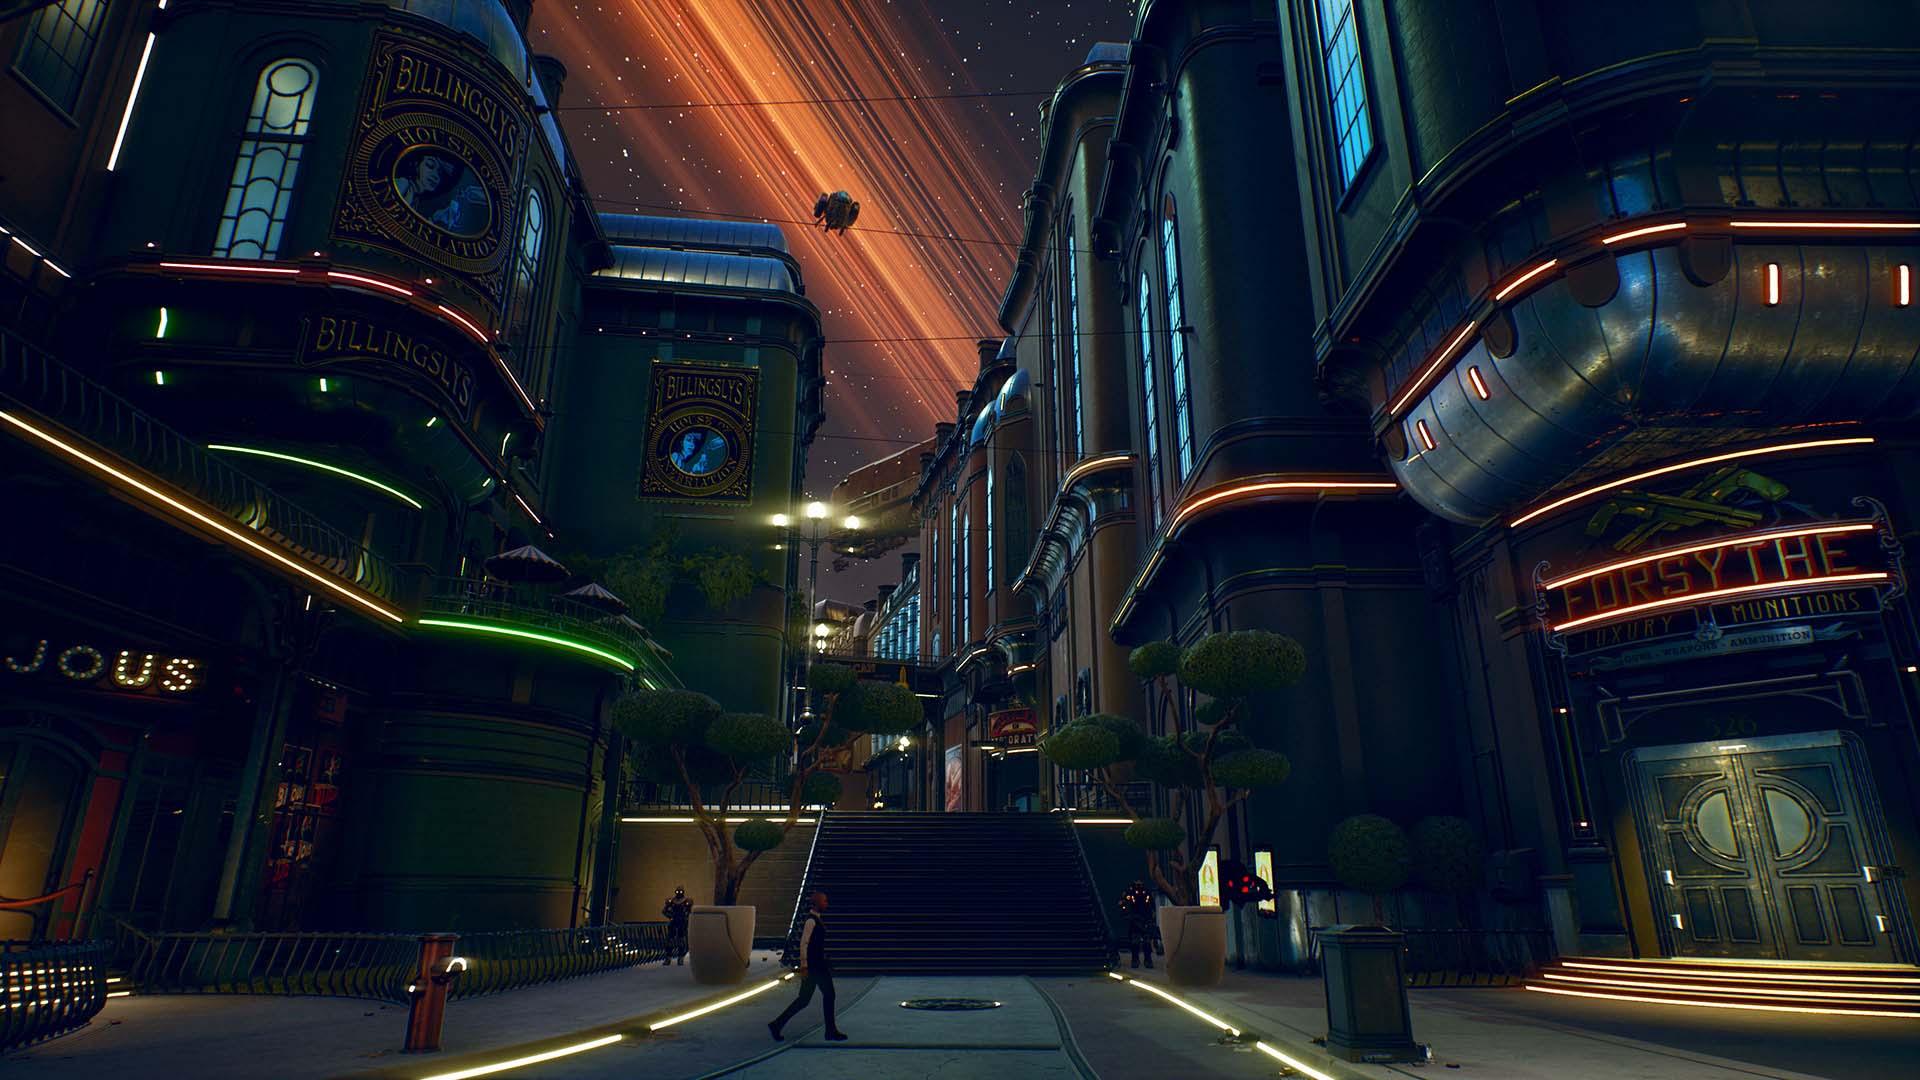 The Outer Worlds - Eine Sci-Fi-Stadt